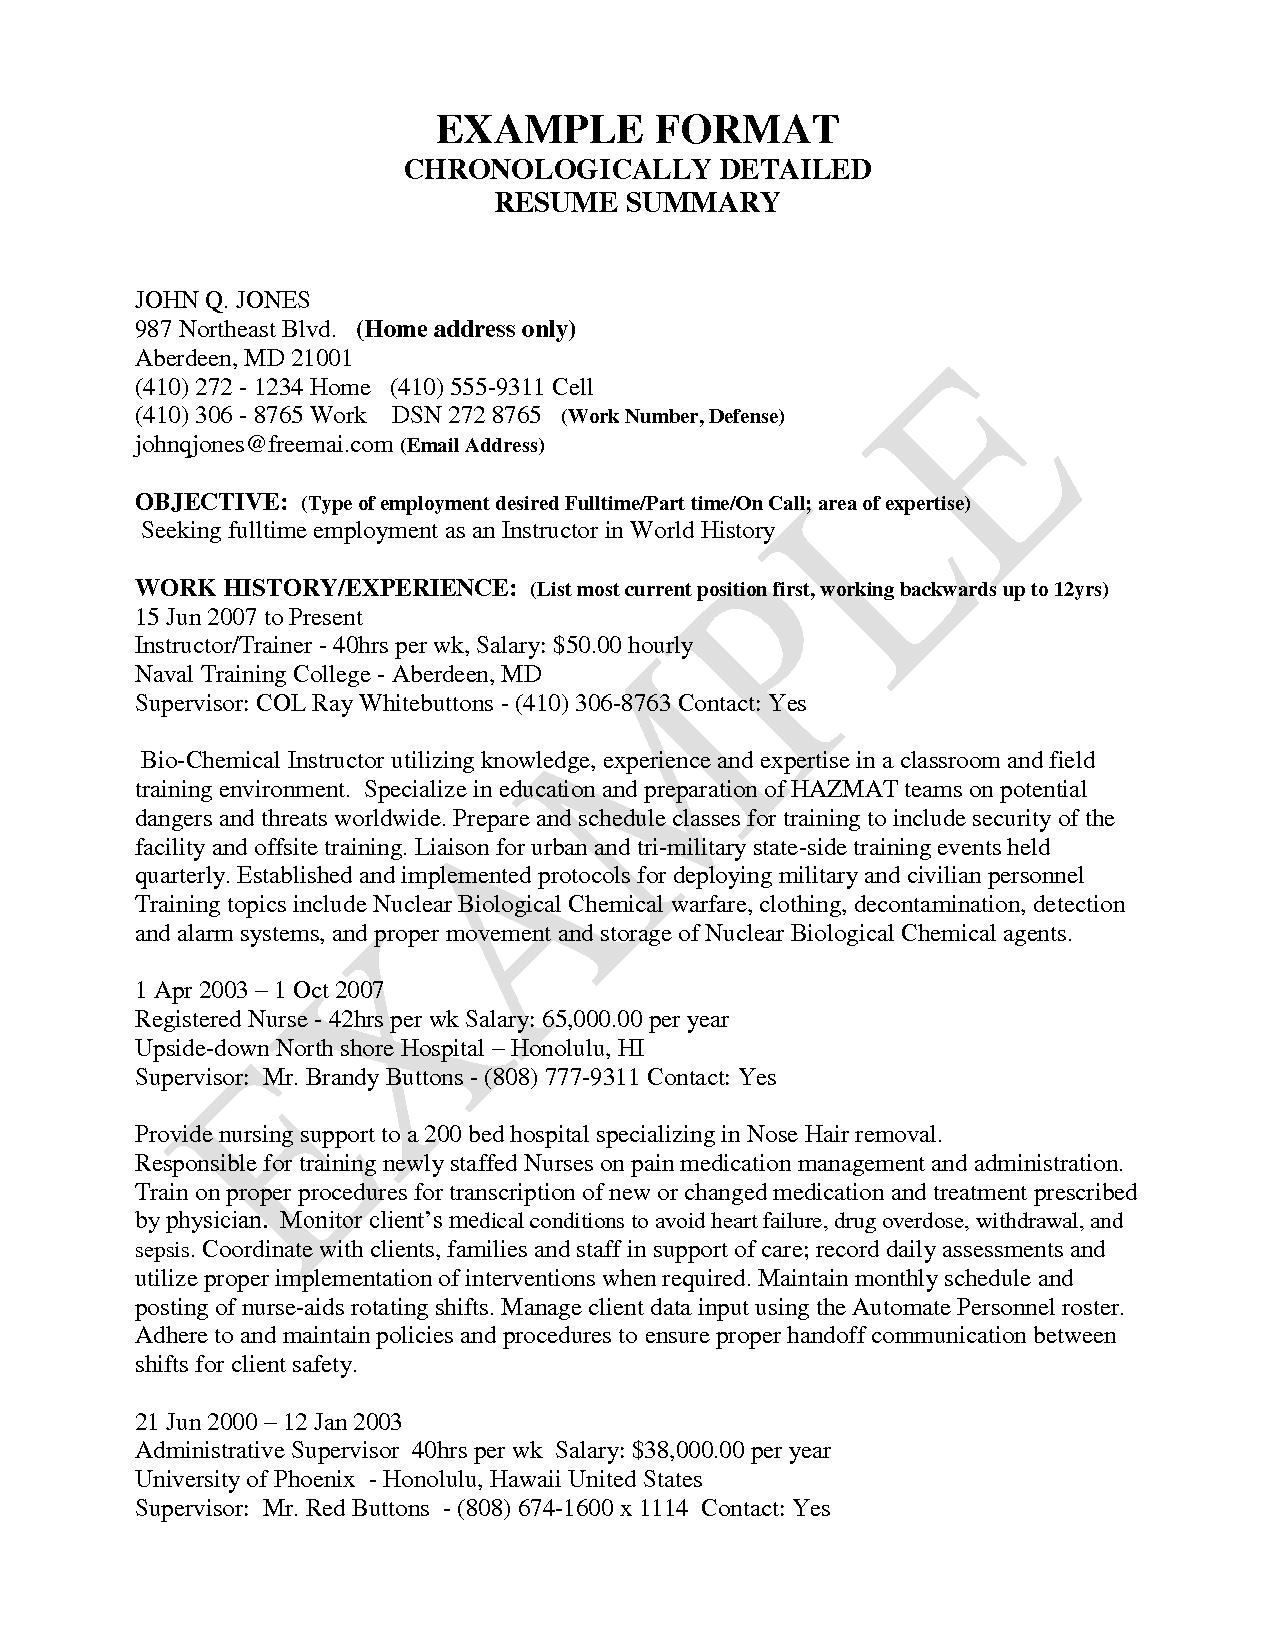 nursing resume template graduate nurse examples student makeup ...